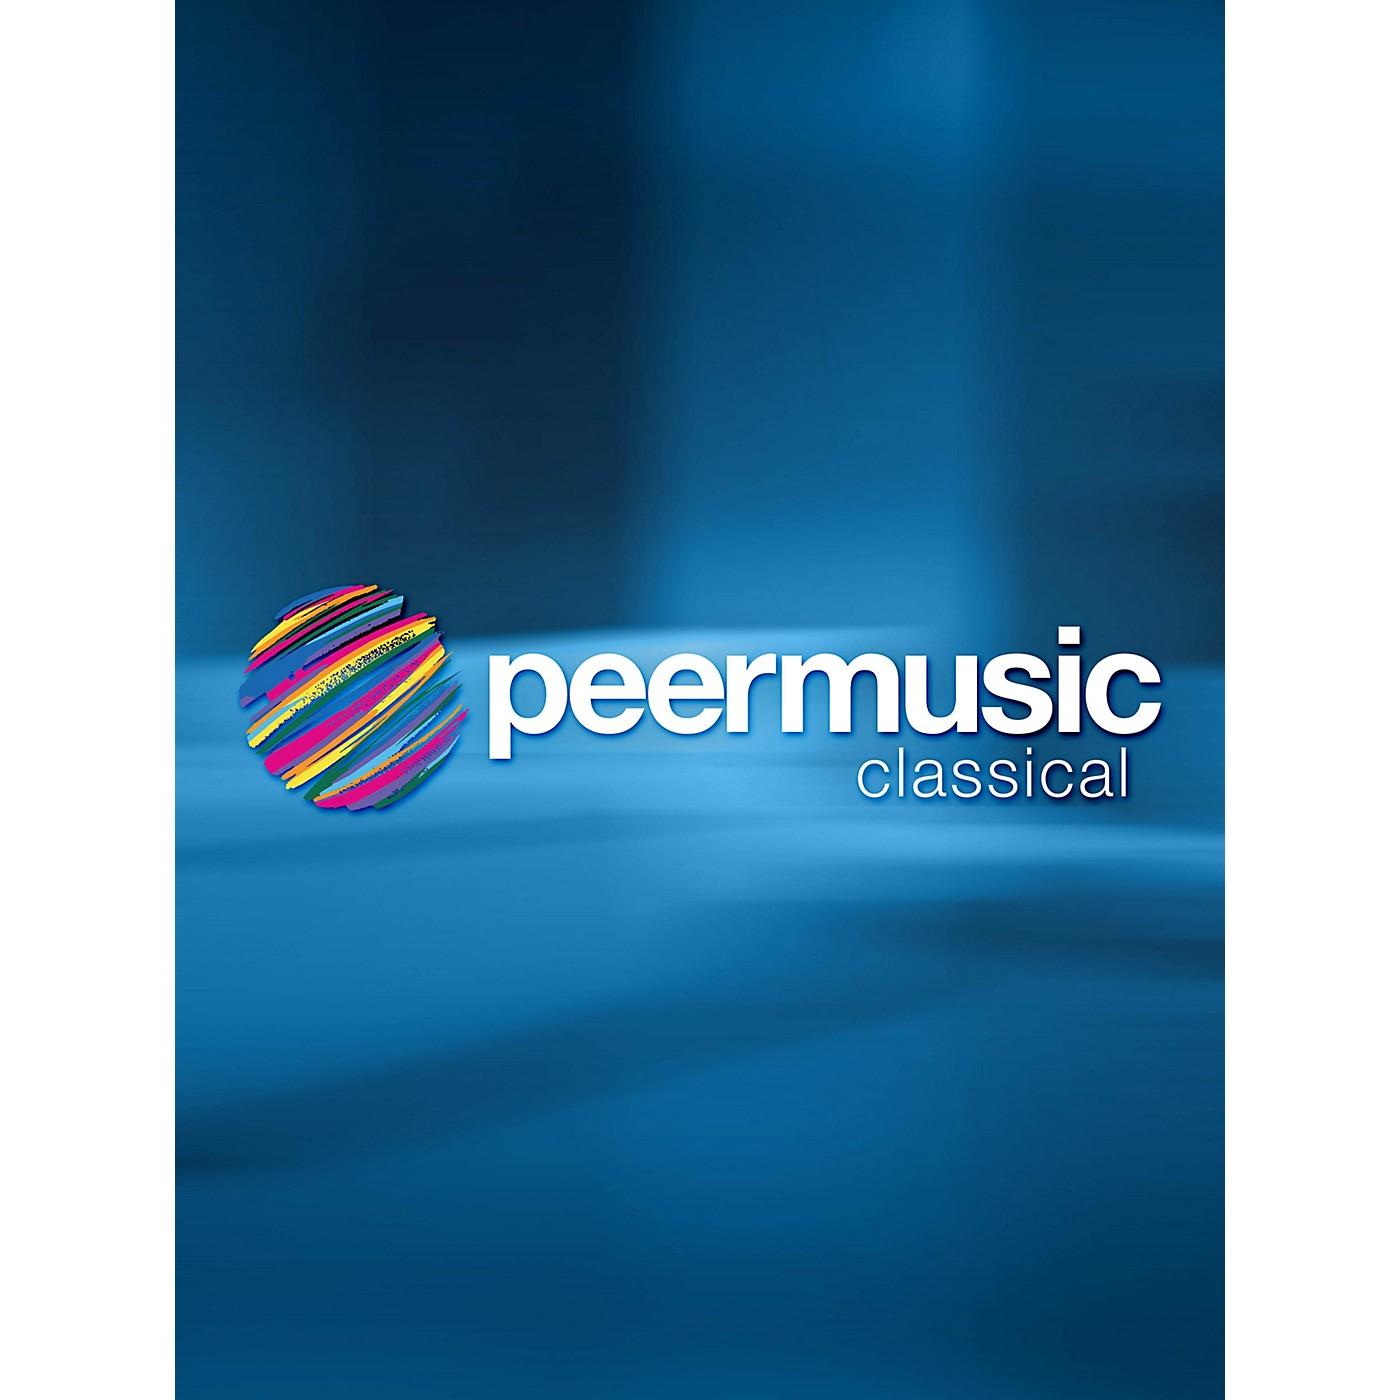 Peer Music Piano Concerto (Intermezzo and Rondo) Peermusic Classical Series Composed by Artur Schnabel thumbnail